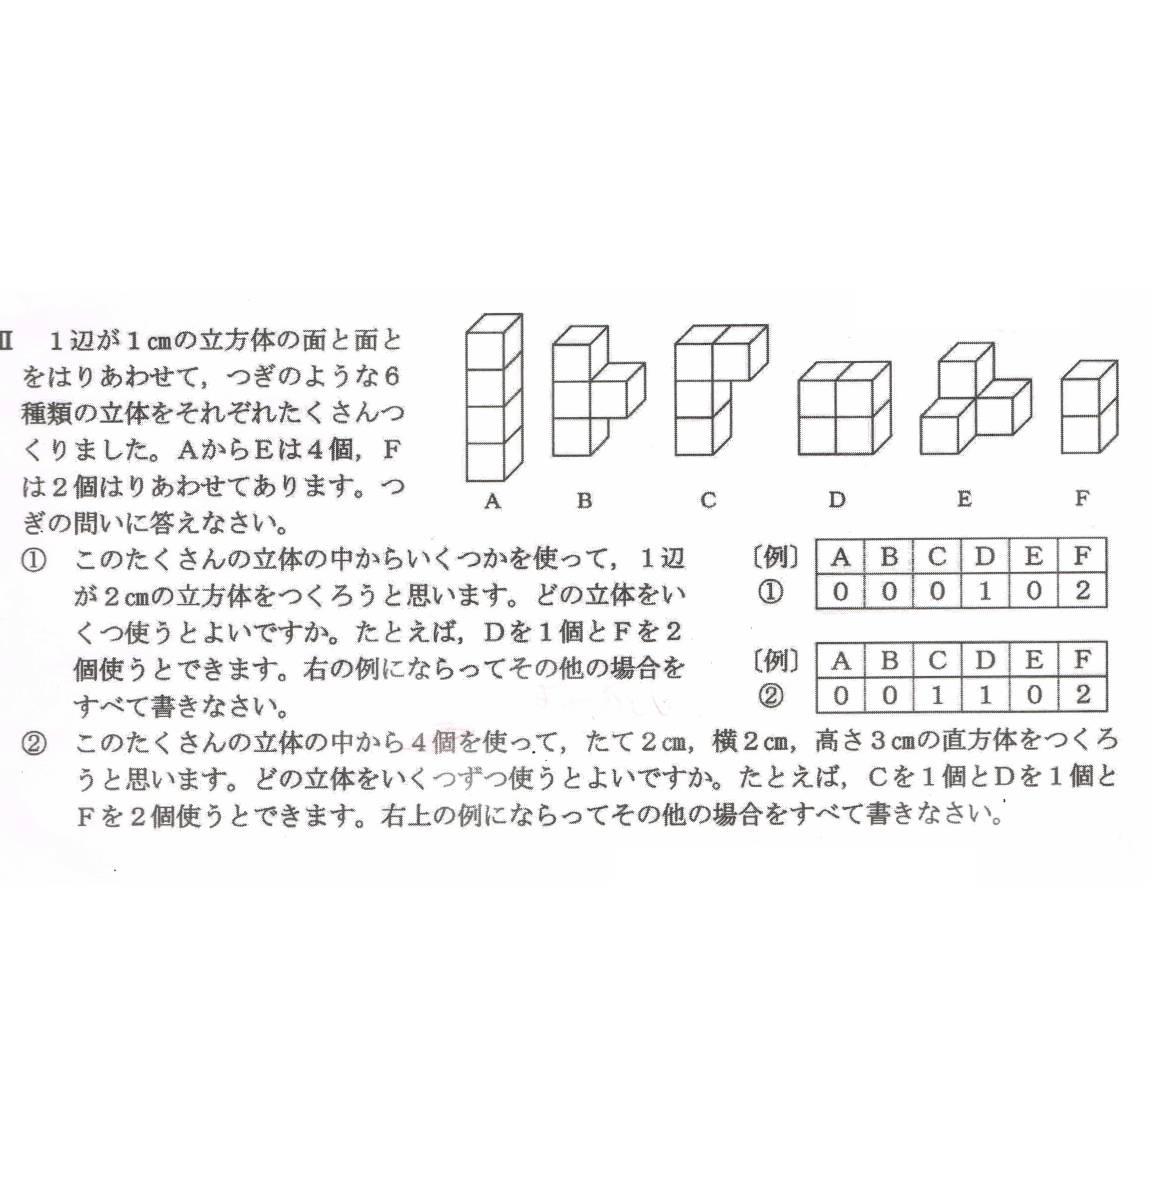 (5d)ニキーチン みんなの積み木 解答編 手本セット パターンカード つみき 家庭保育園 モンテッソーリ 中学受験 立体 公文_画像3